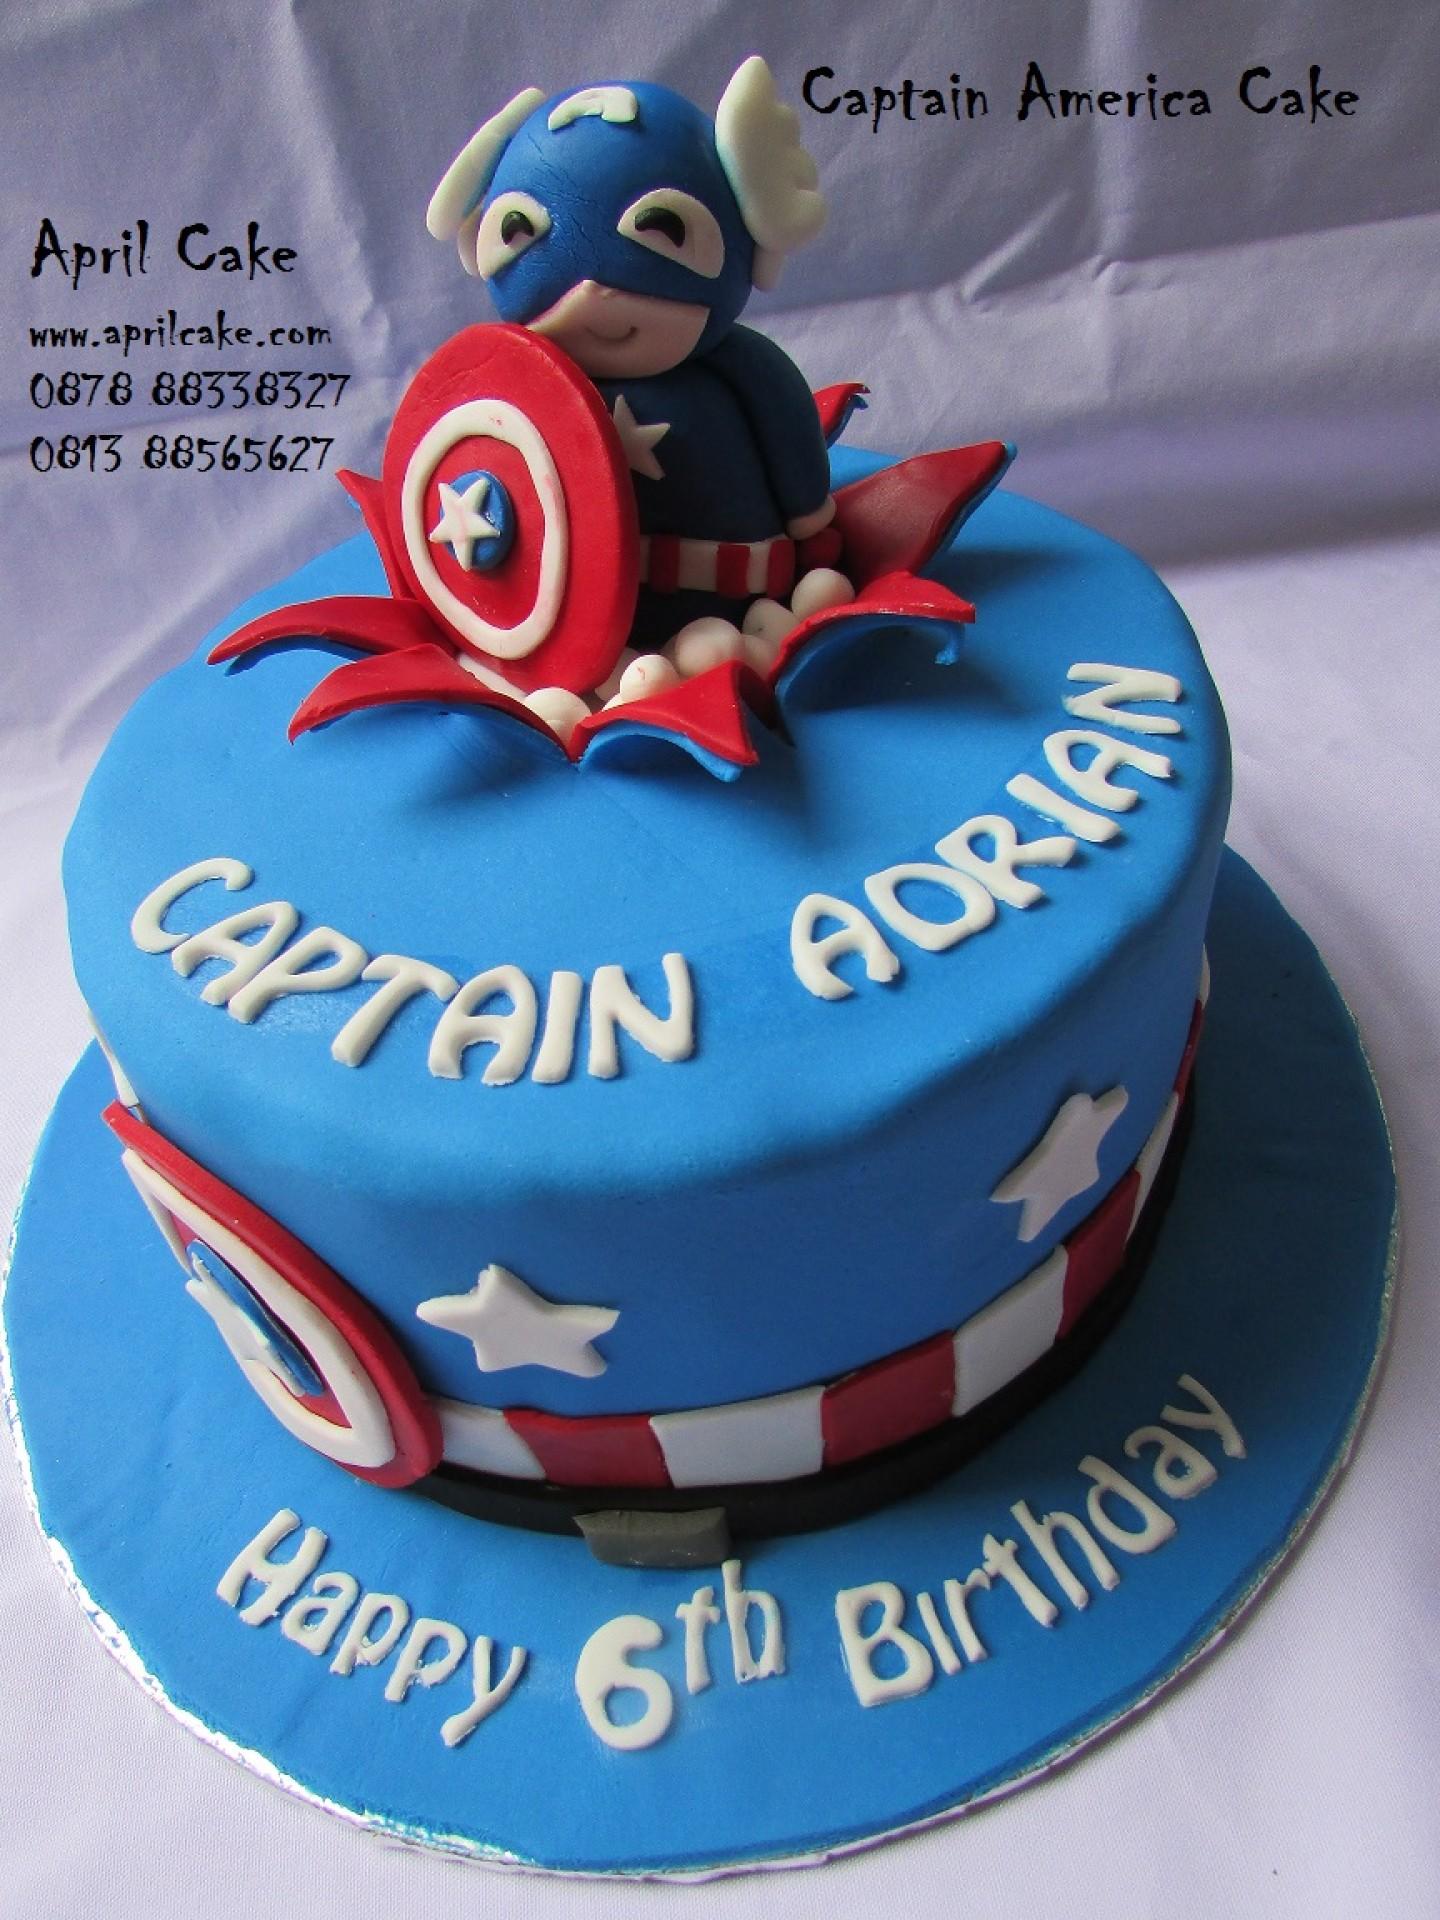 Image for Captain America Birthday Cake Ideas